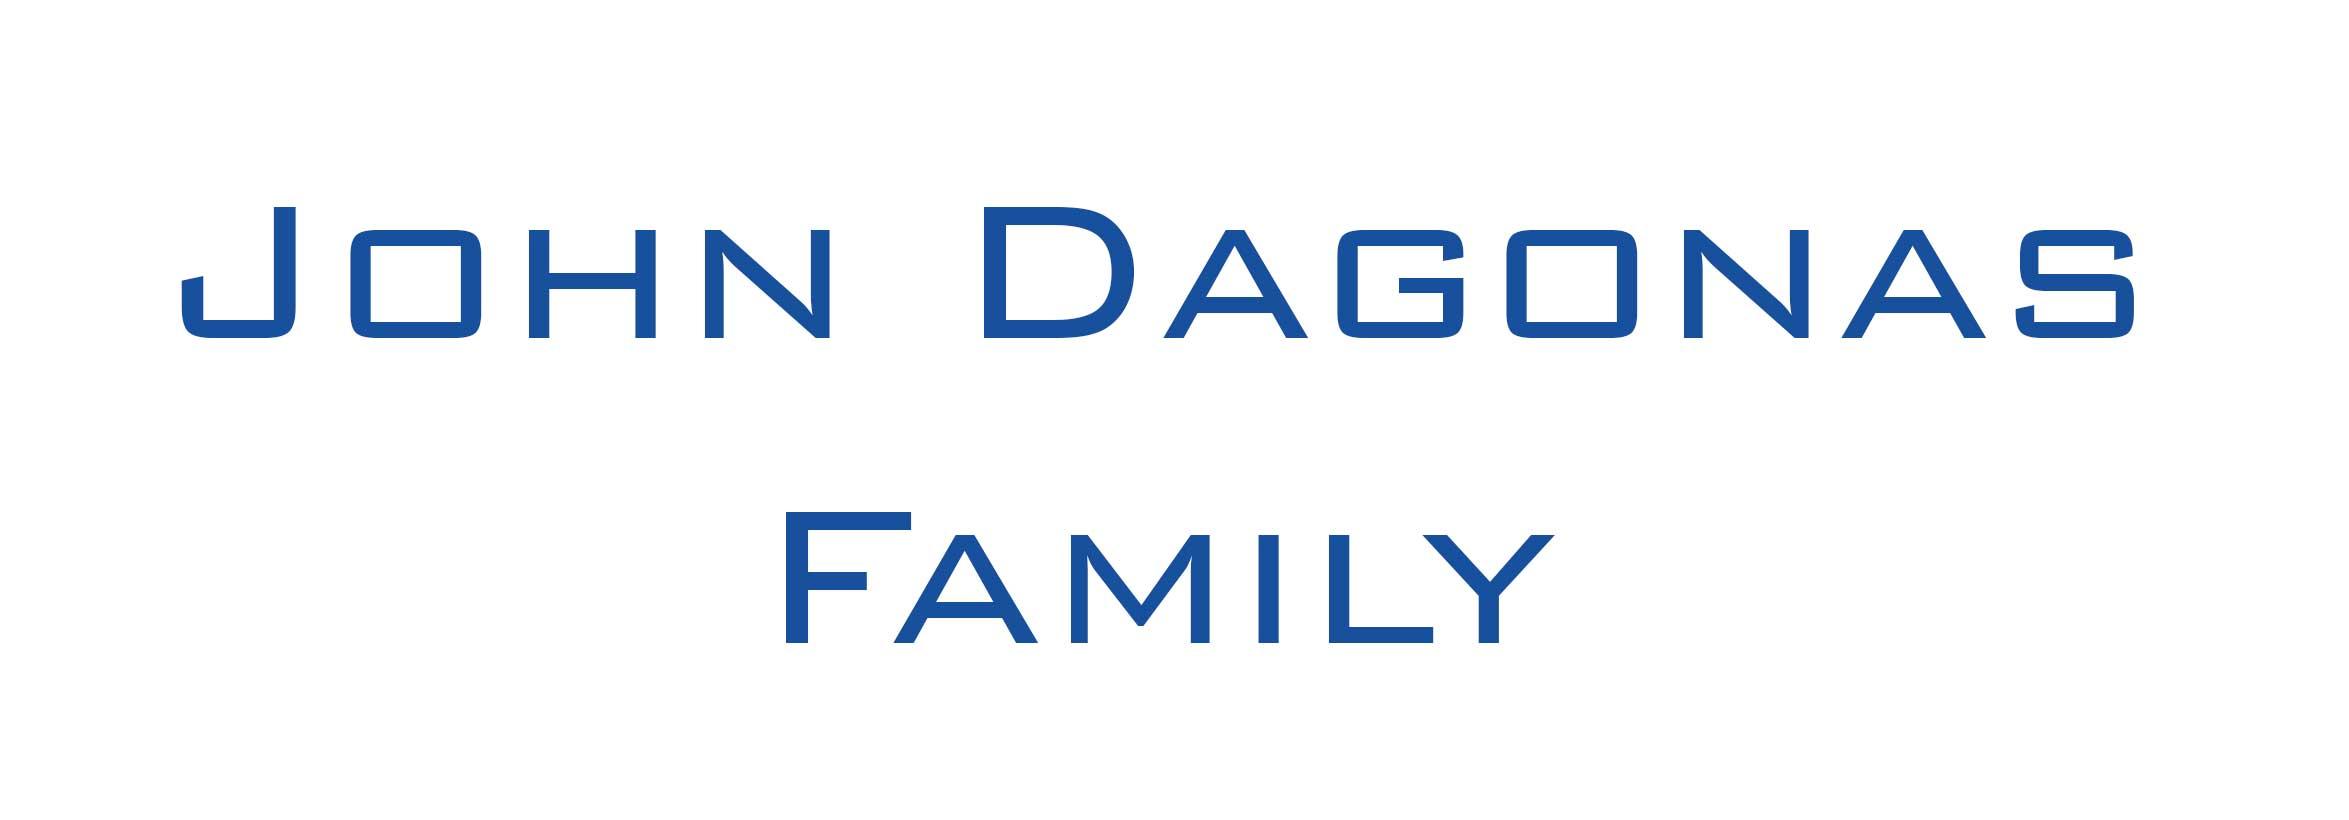 John Dagonas Family